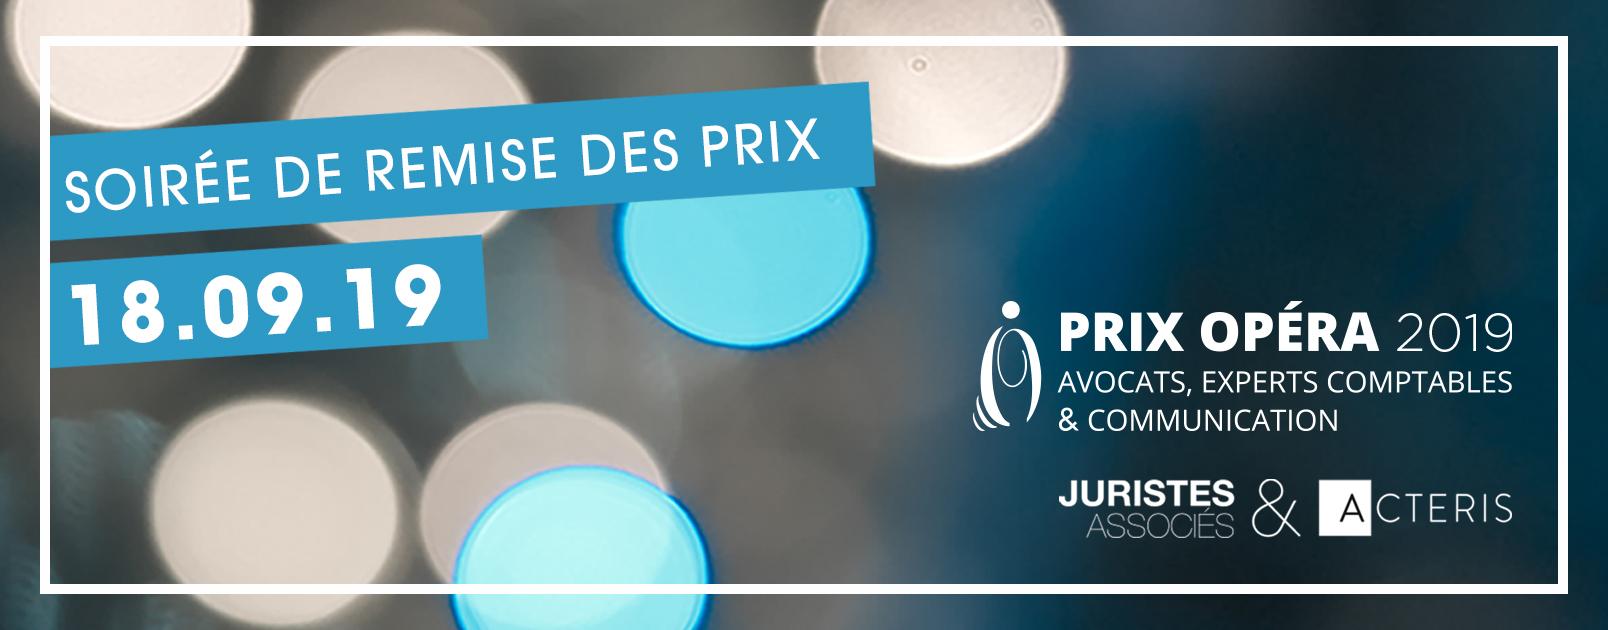 PRIX OPERA 2019 - remise des prix